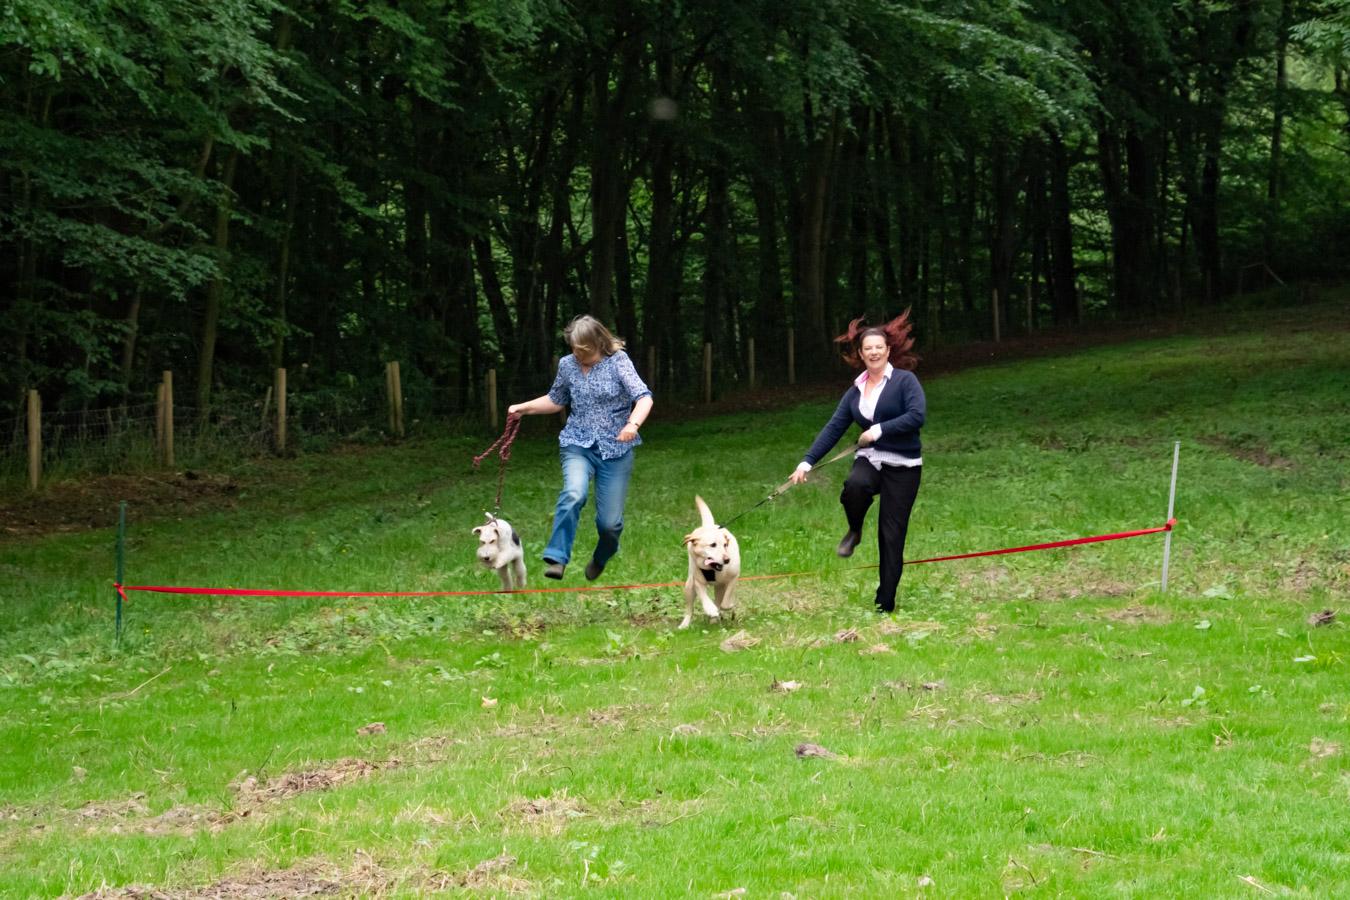 Monkton-Wyld-Best-Camping-Caravanning-West-Dorset-Dog-Friendly-Walk-7